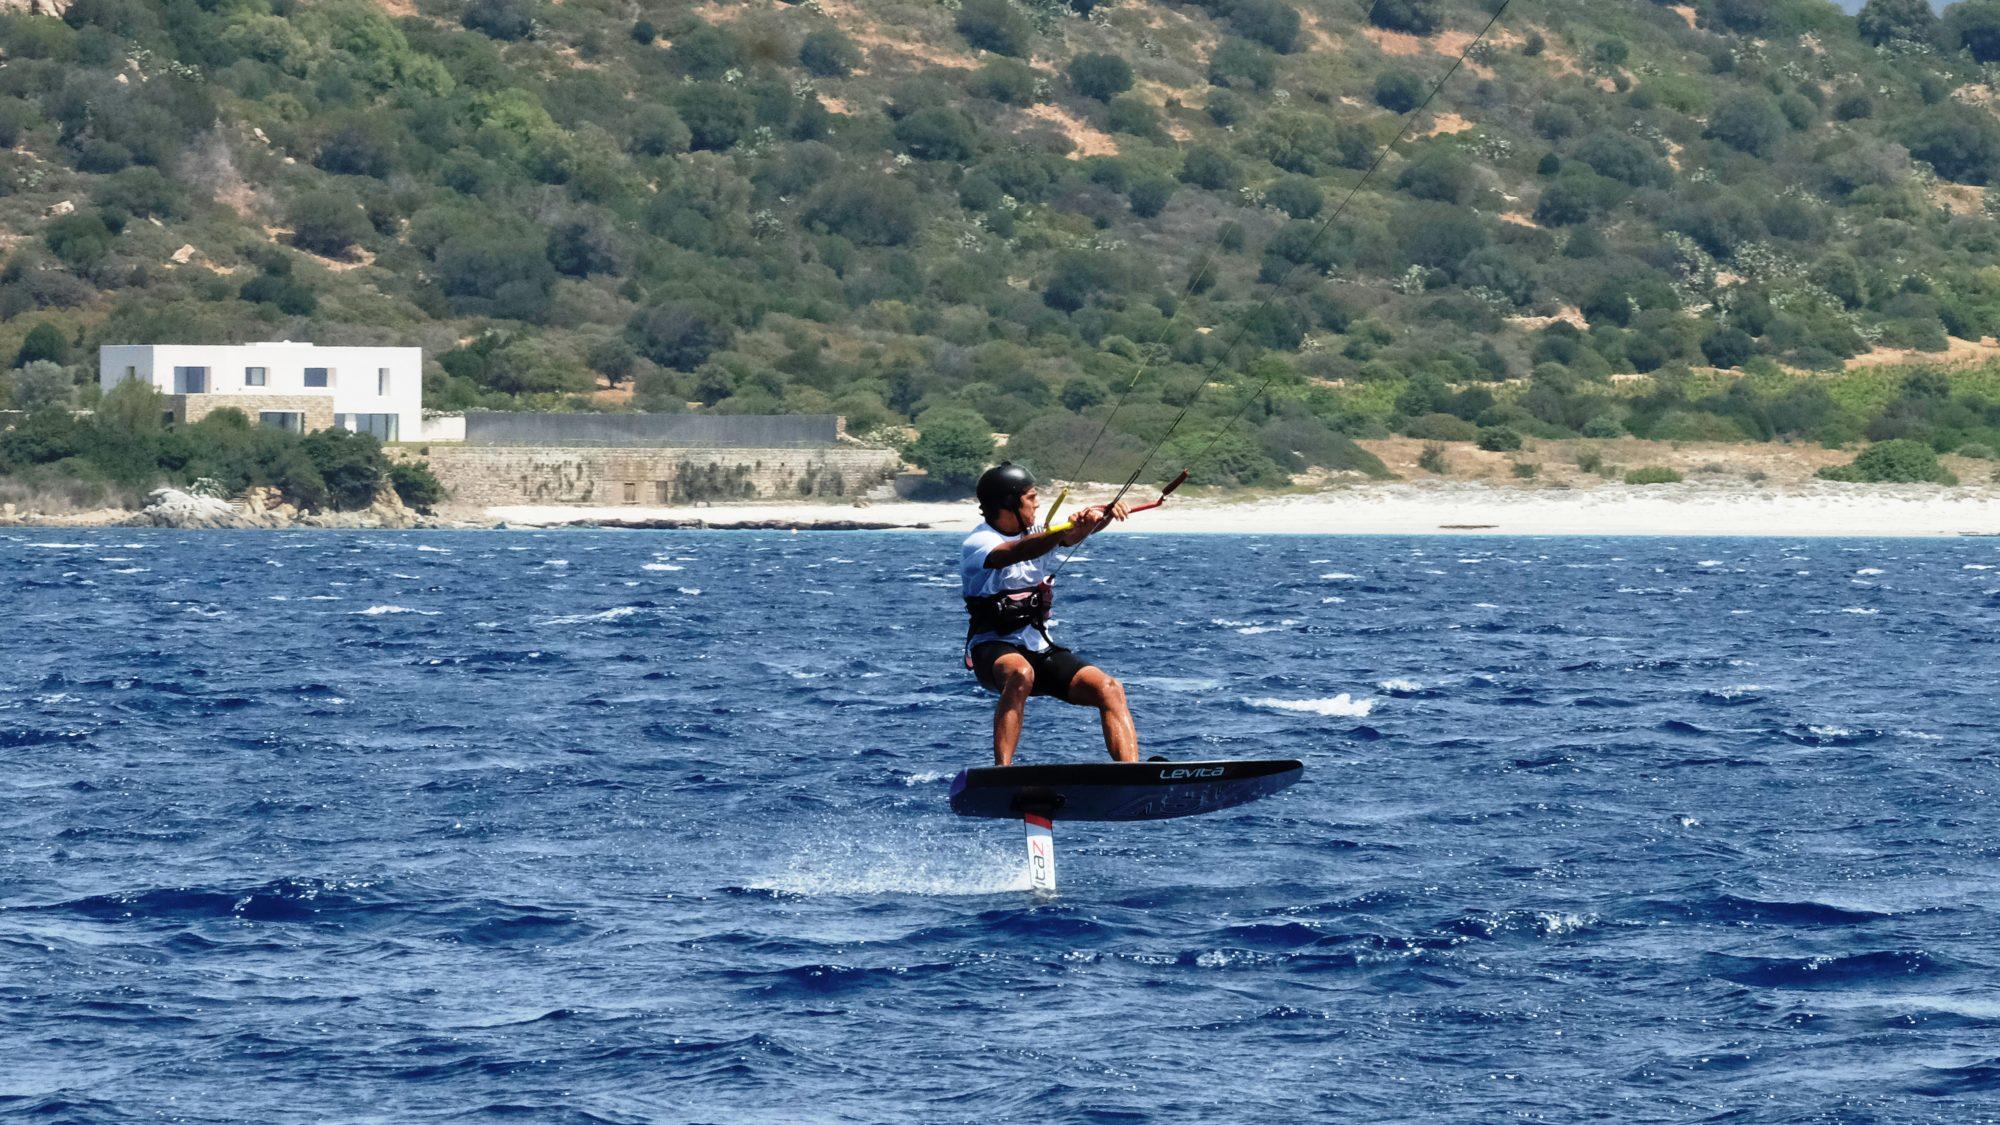 Kite a Villasmius Sardegna con Hydrofoil Lucas Rey 10 Maggio 2017